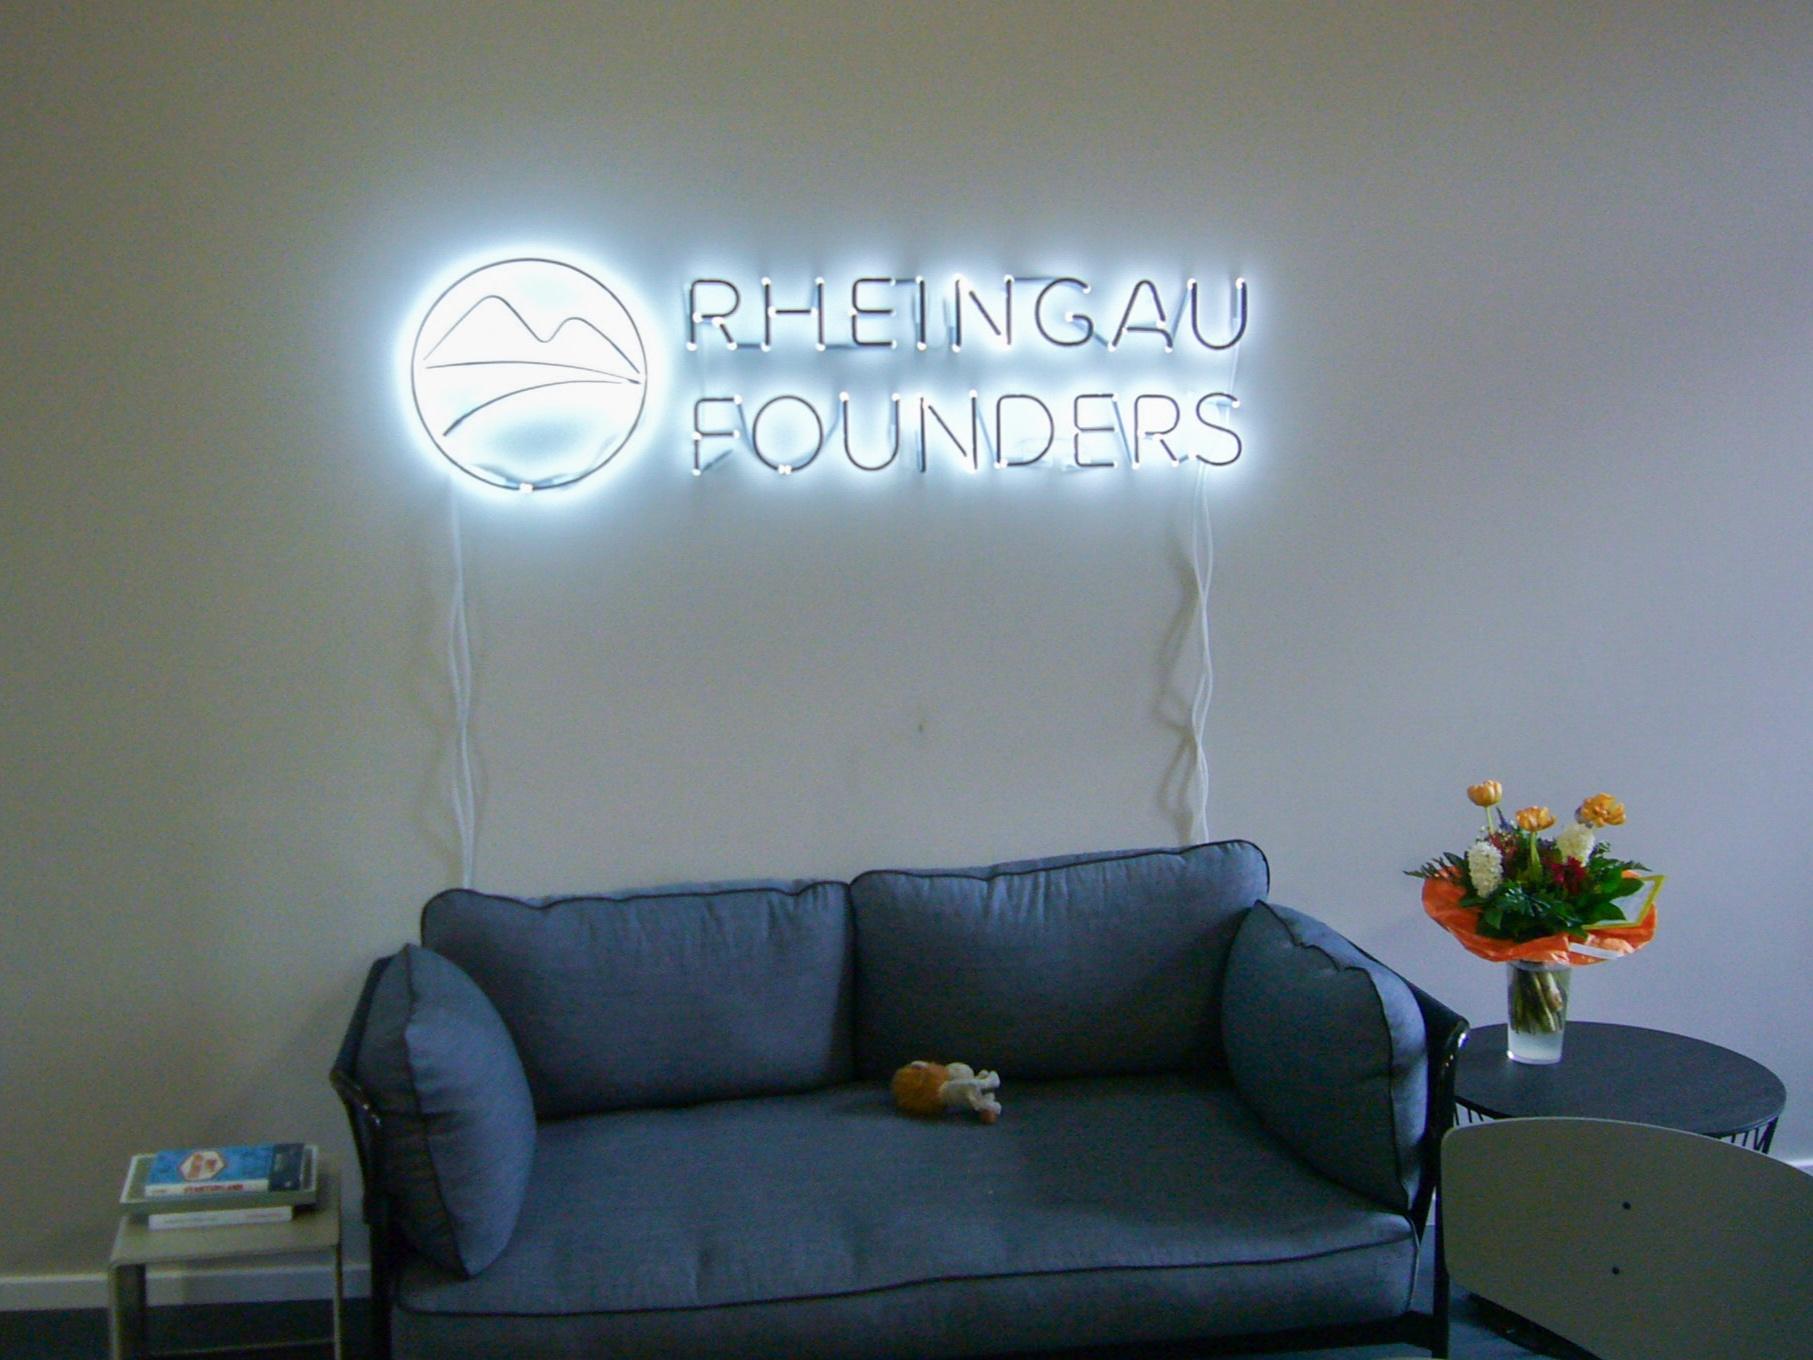 06-Reingau_Founders-LIGNE Architekten.jpg